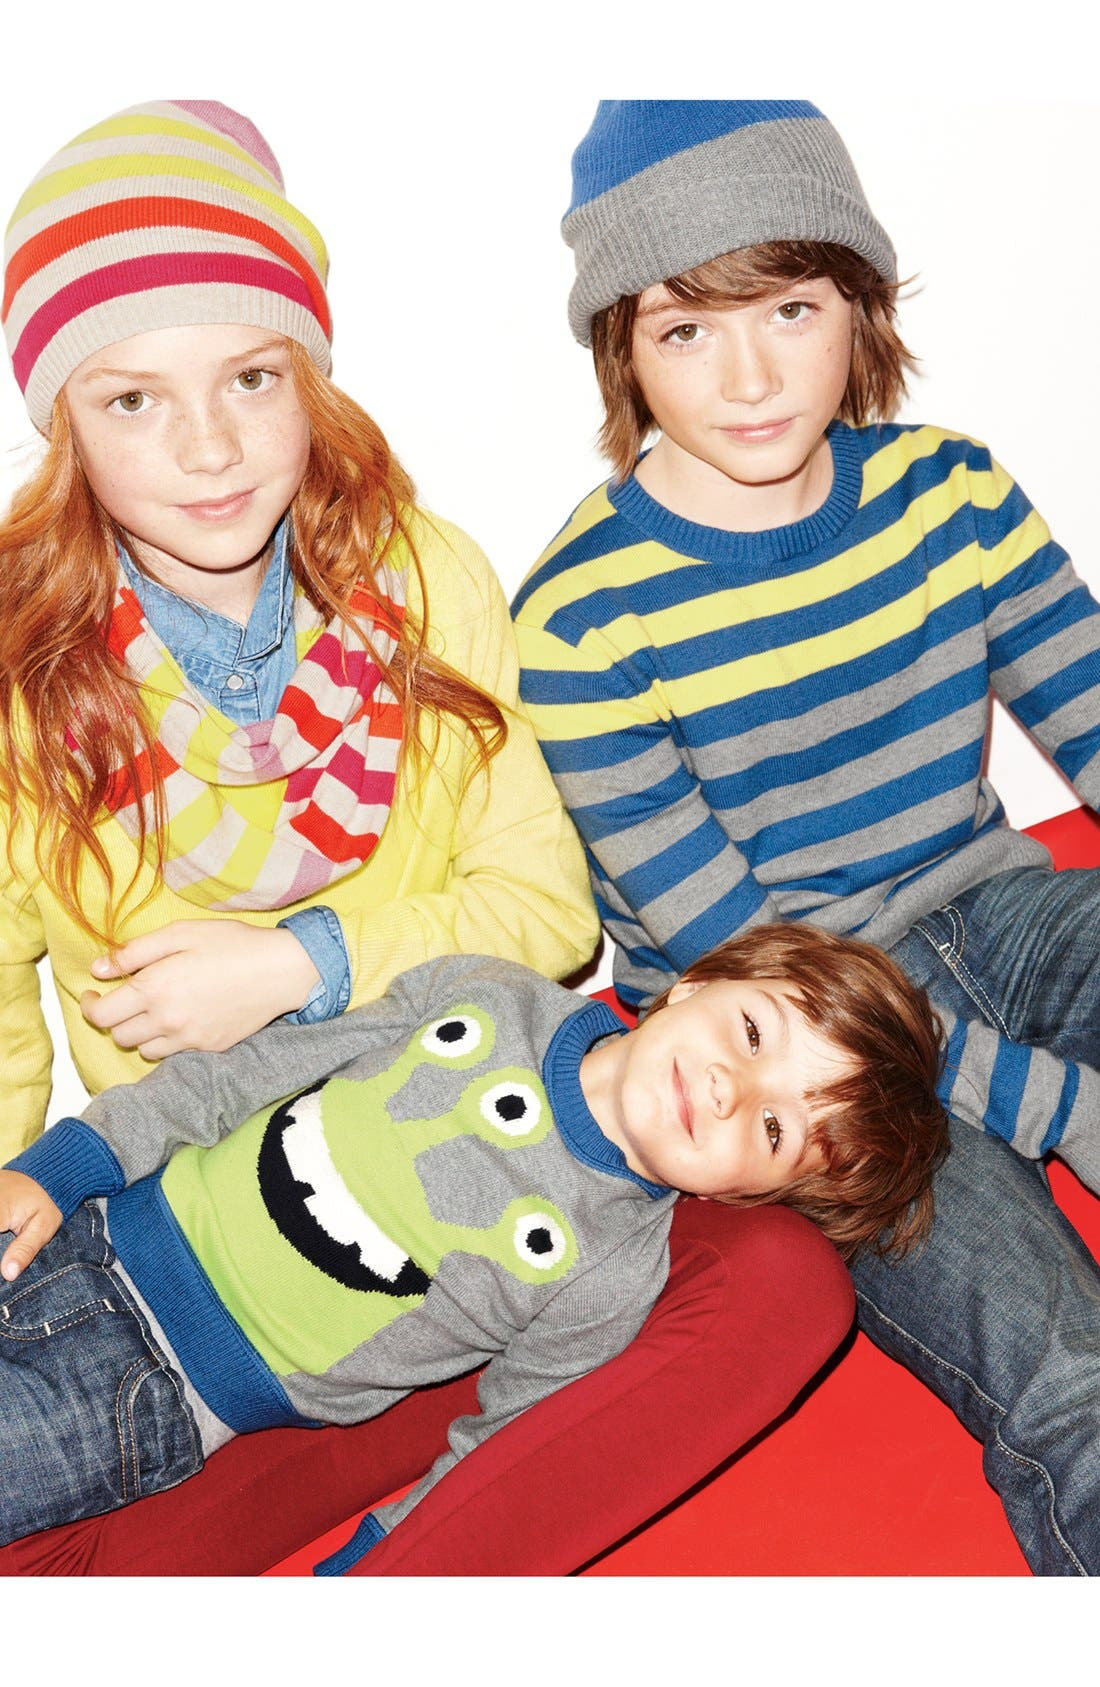 Alternate Image 1 Selected - Tucker + Tate Sweater, Western Top & Jeggings (Little Girls & Big Girls)